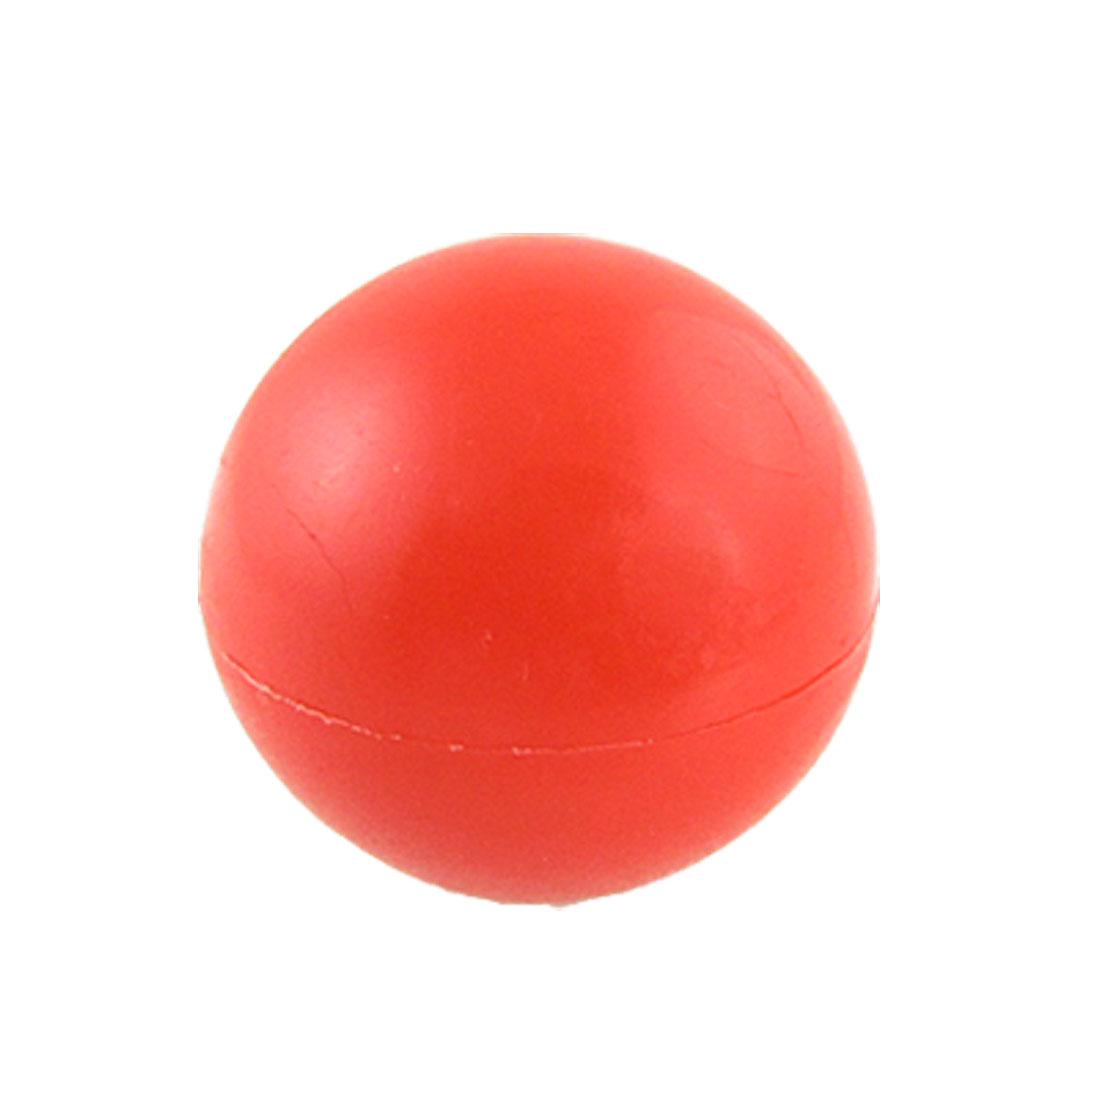 12mm Thread Hole Red Plastic 40mm Diameter Handle Ball Knob